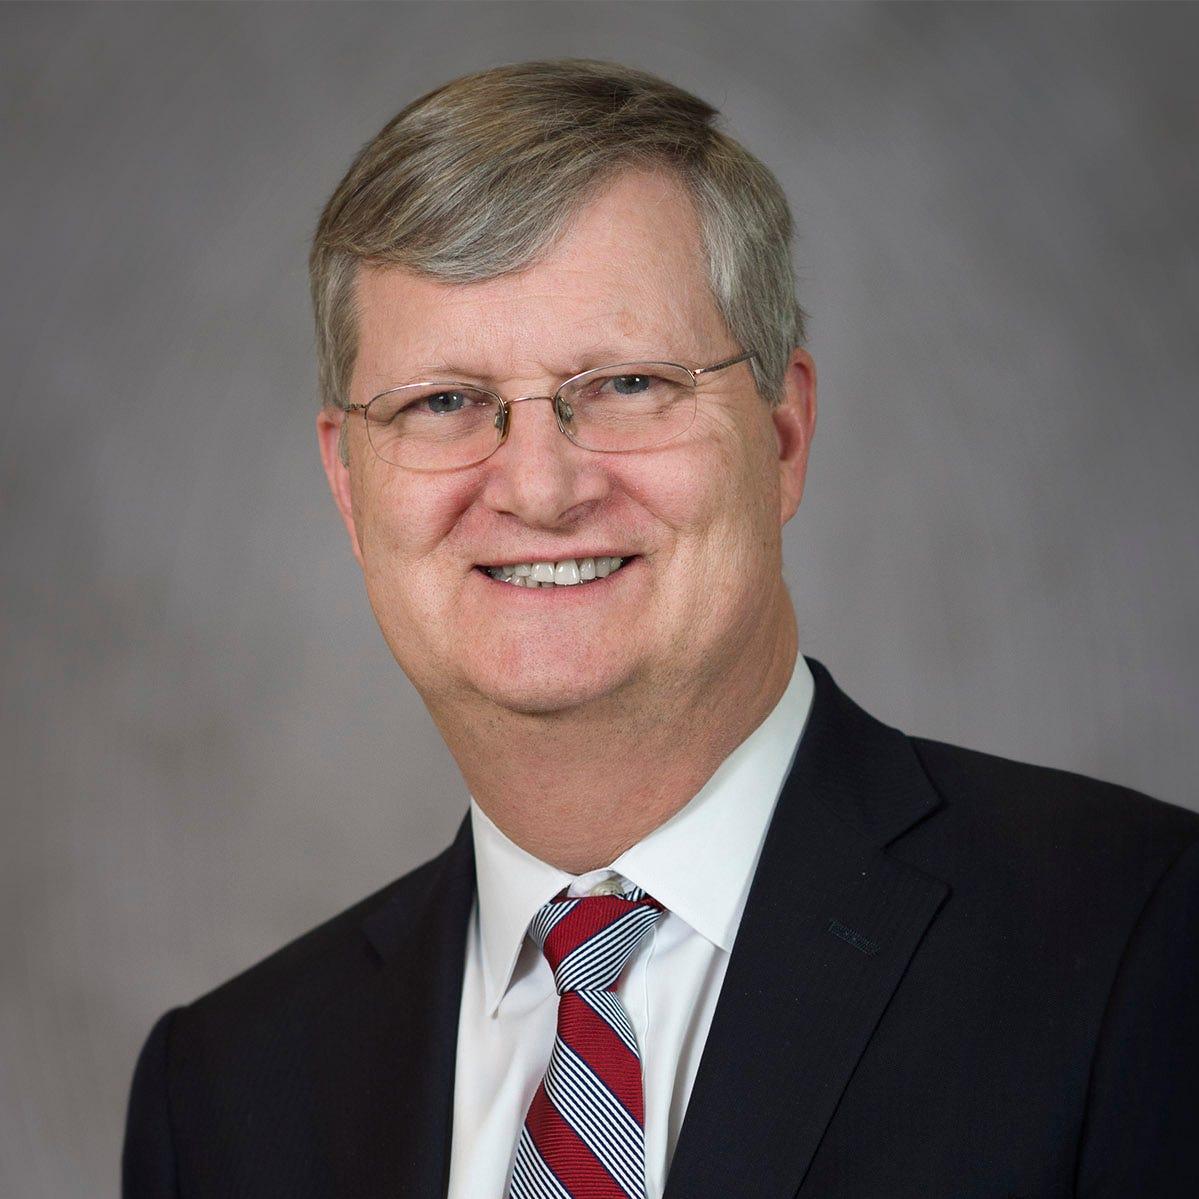 RWJBarnabas Health names David Mebane executive vice president